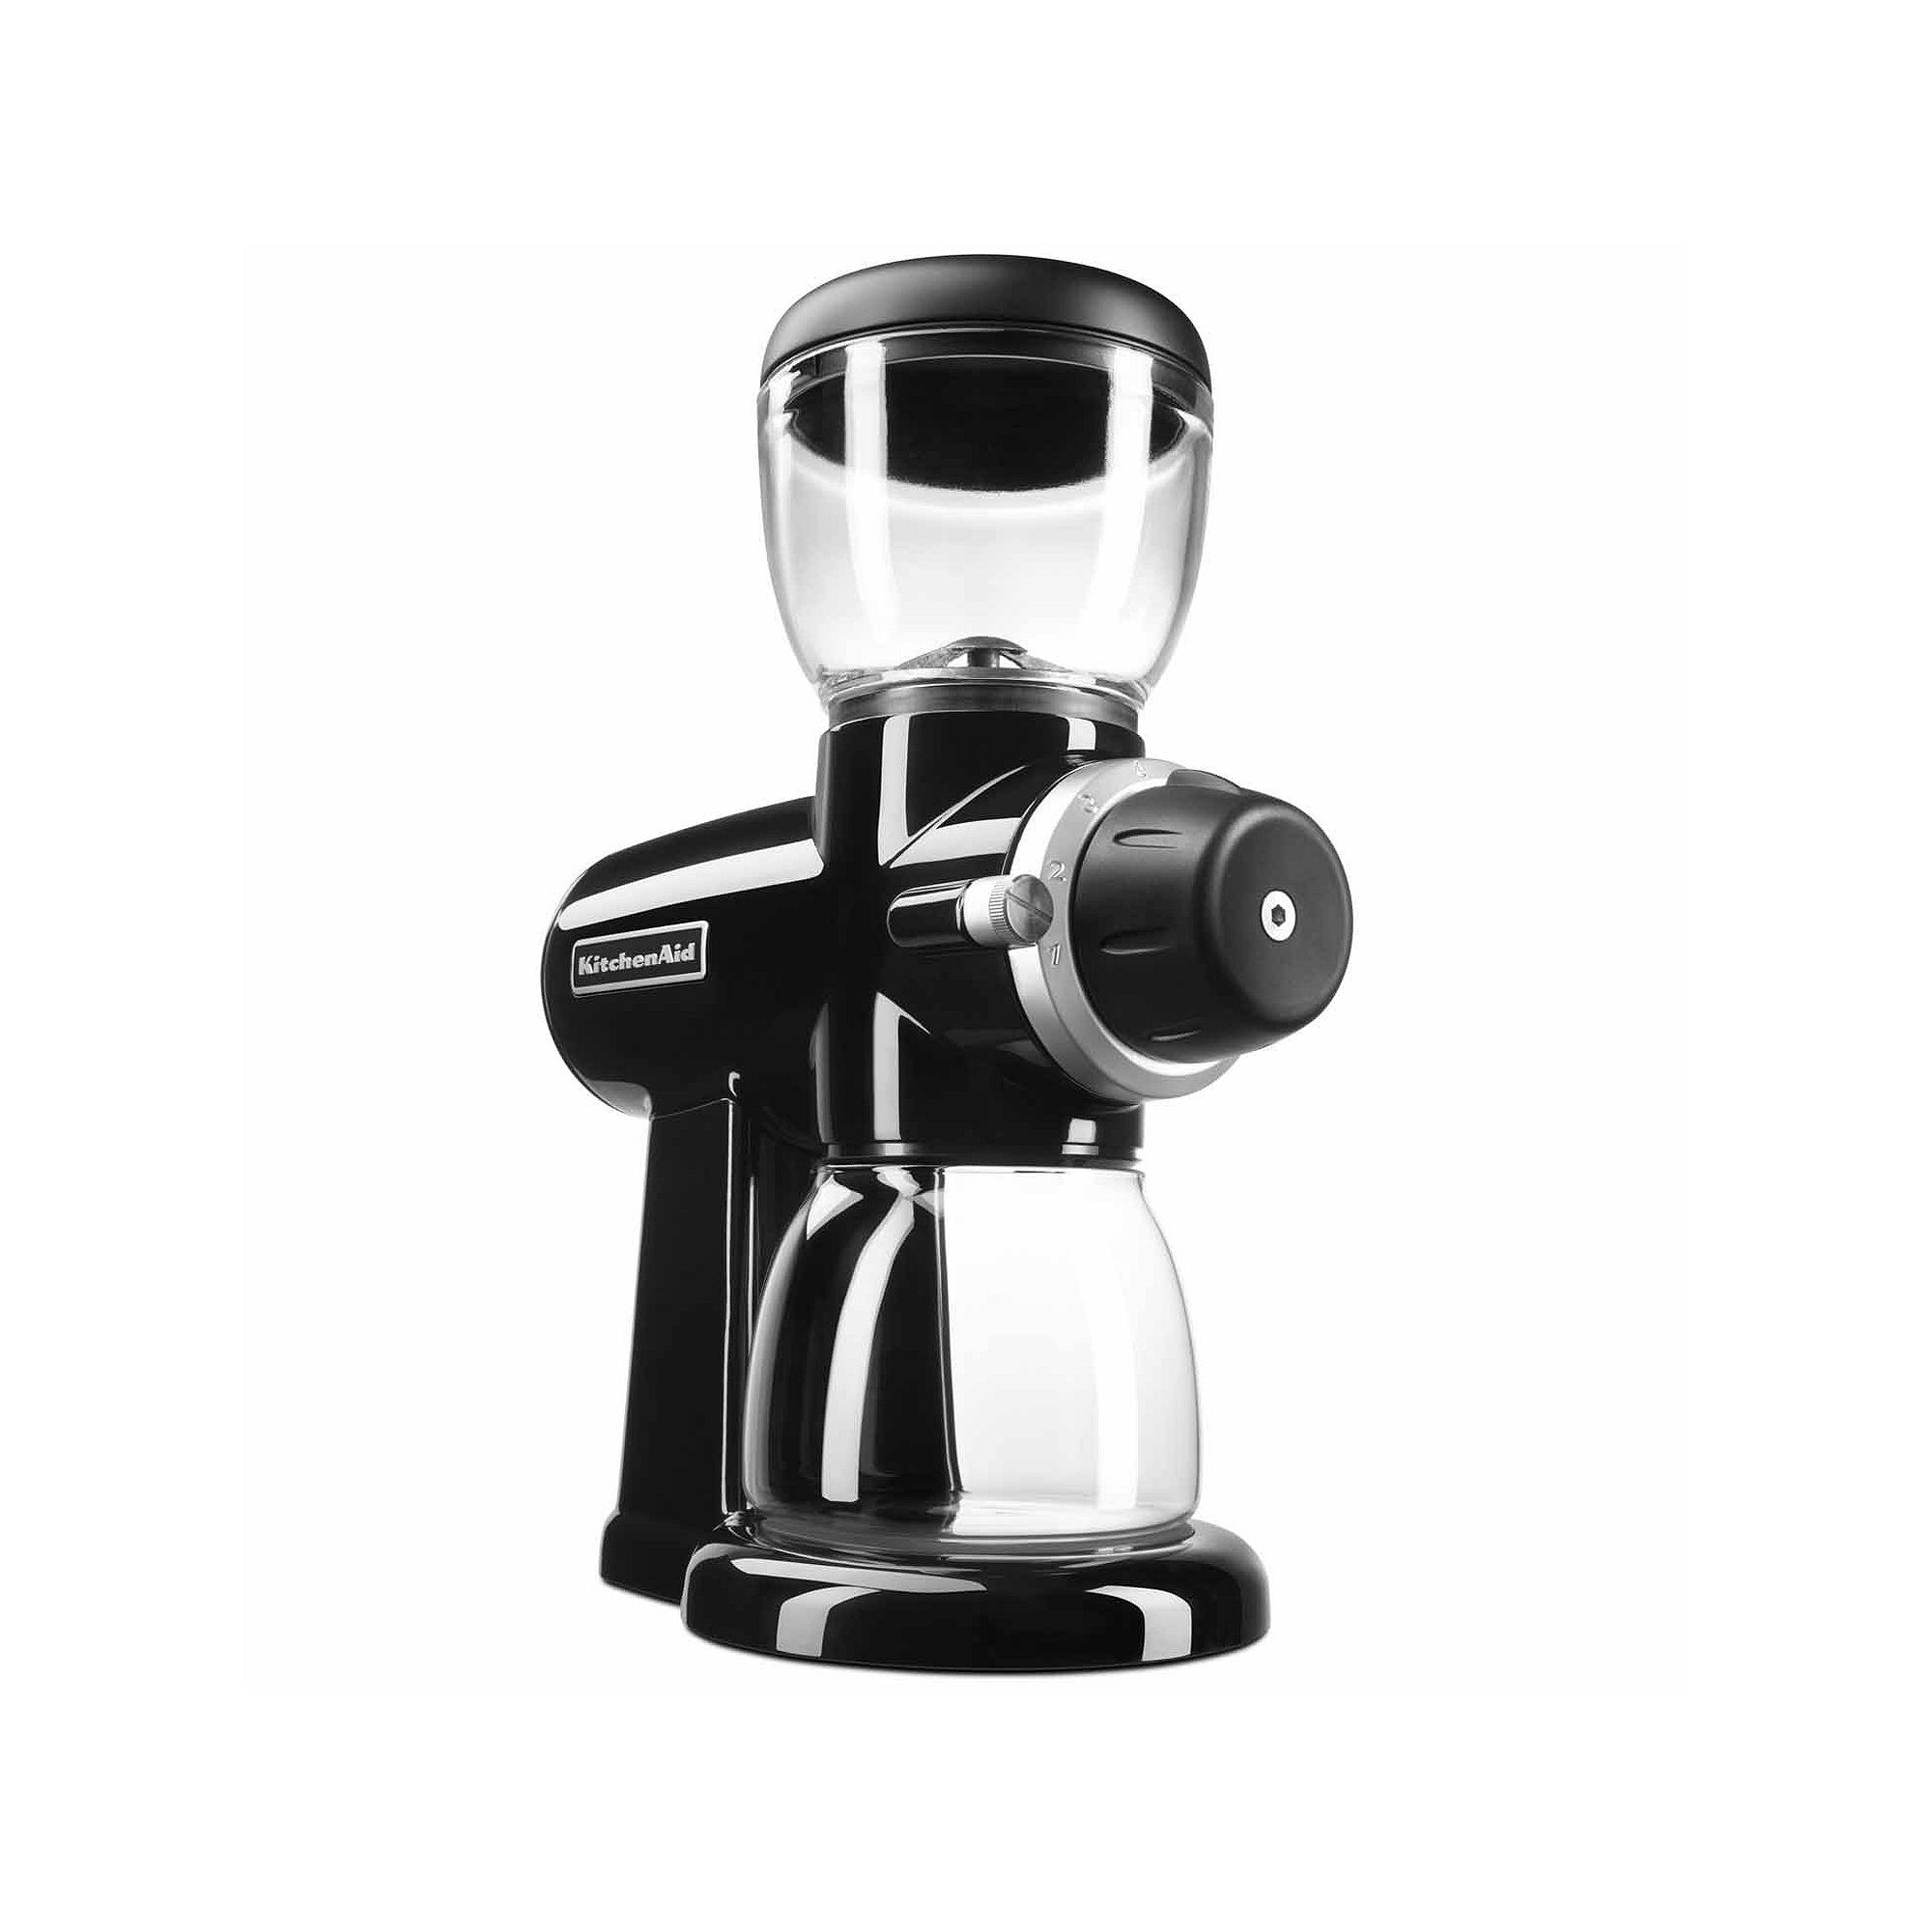 KitchenAid Burr Coffee Grinder KCG0702